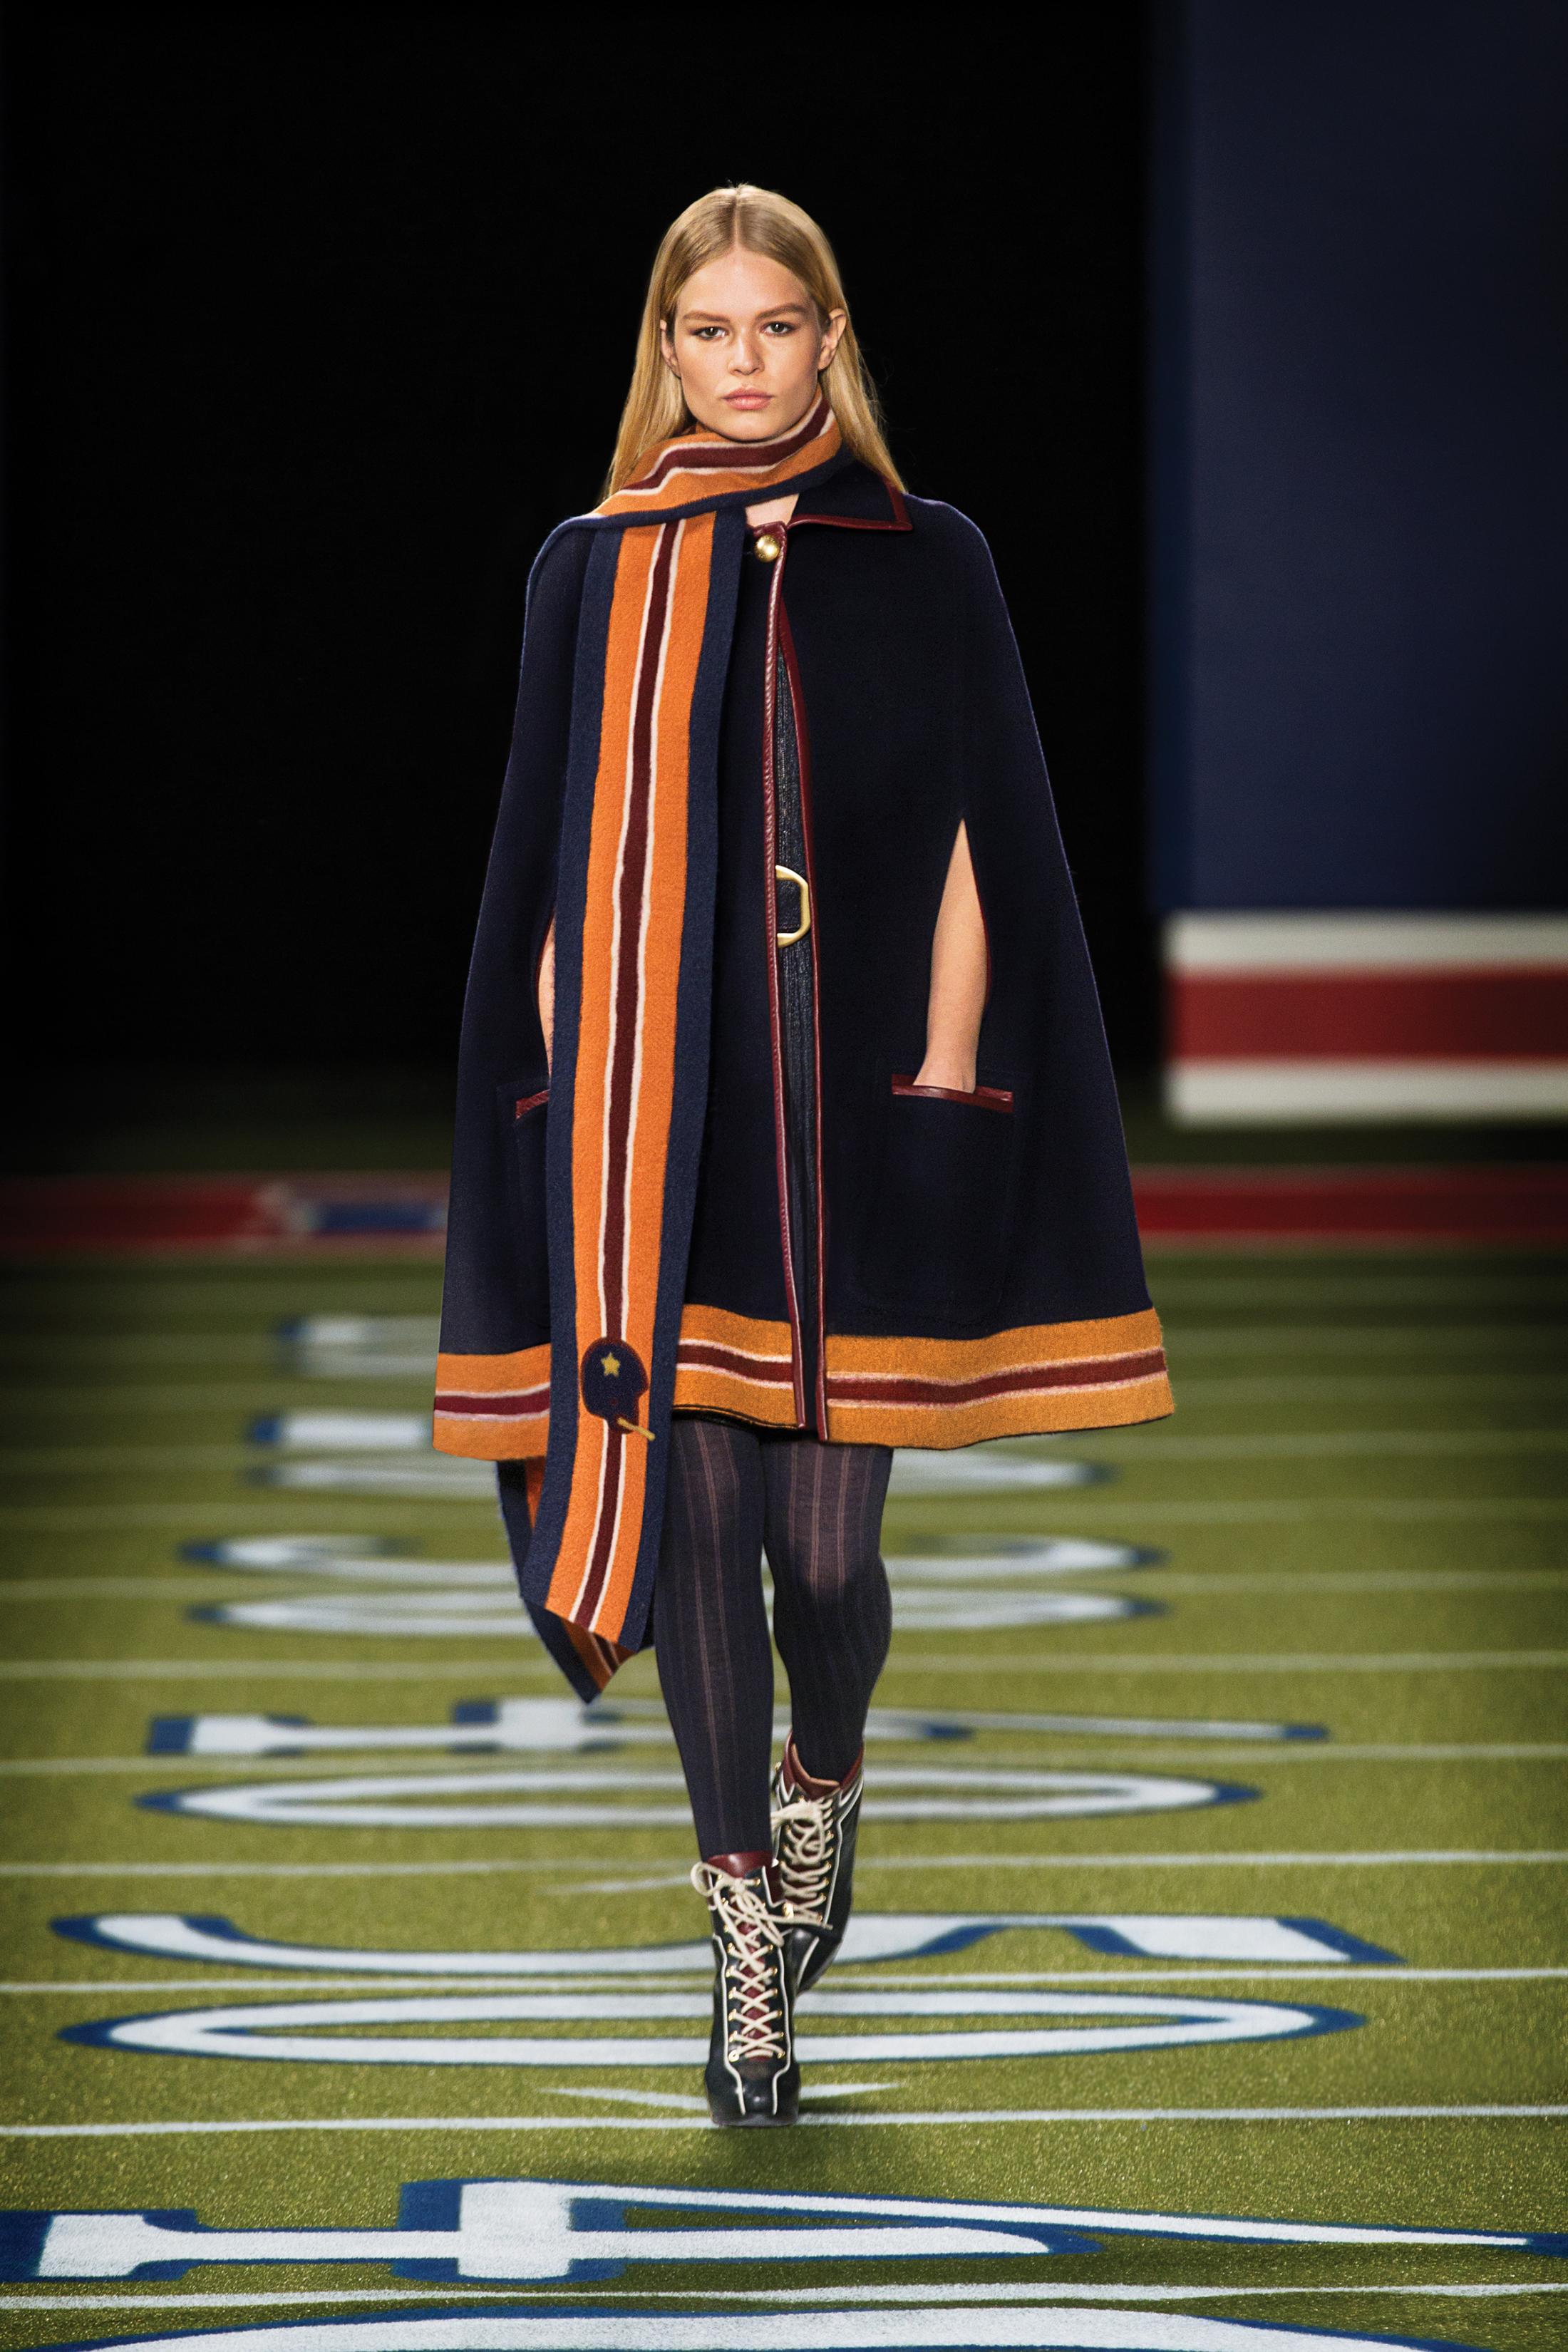 Thumbnail for Fall 2015 Runway Show - Football Theme Clothing Line